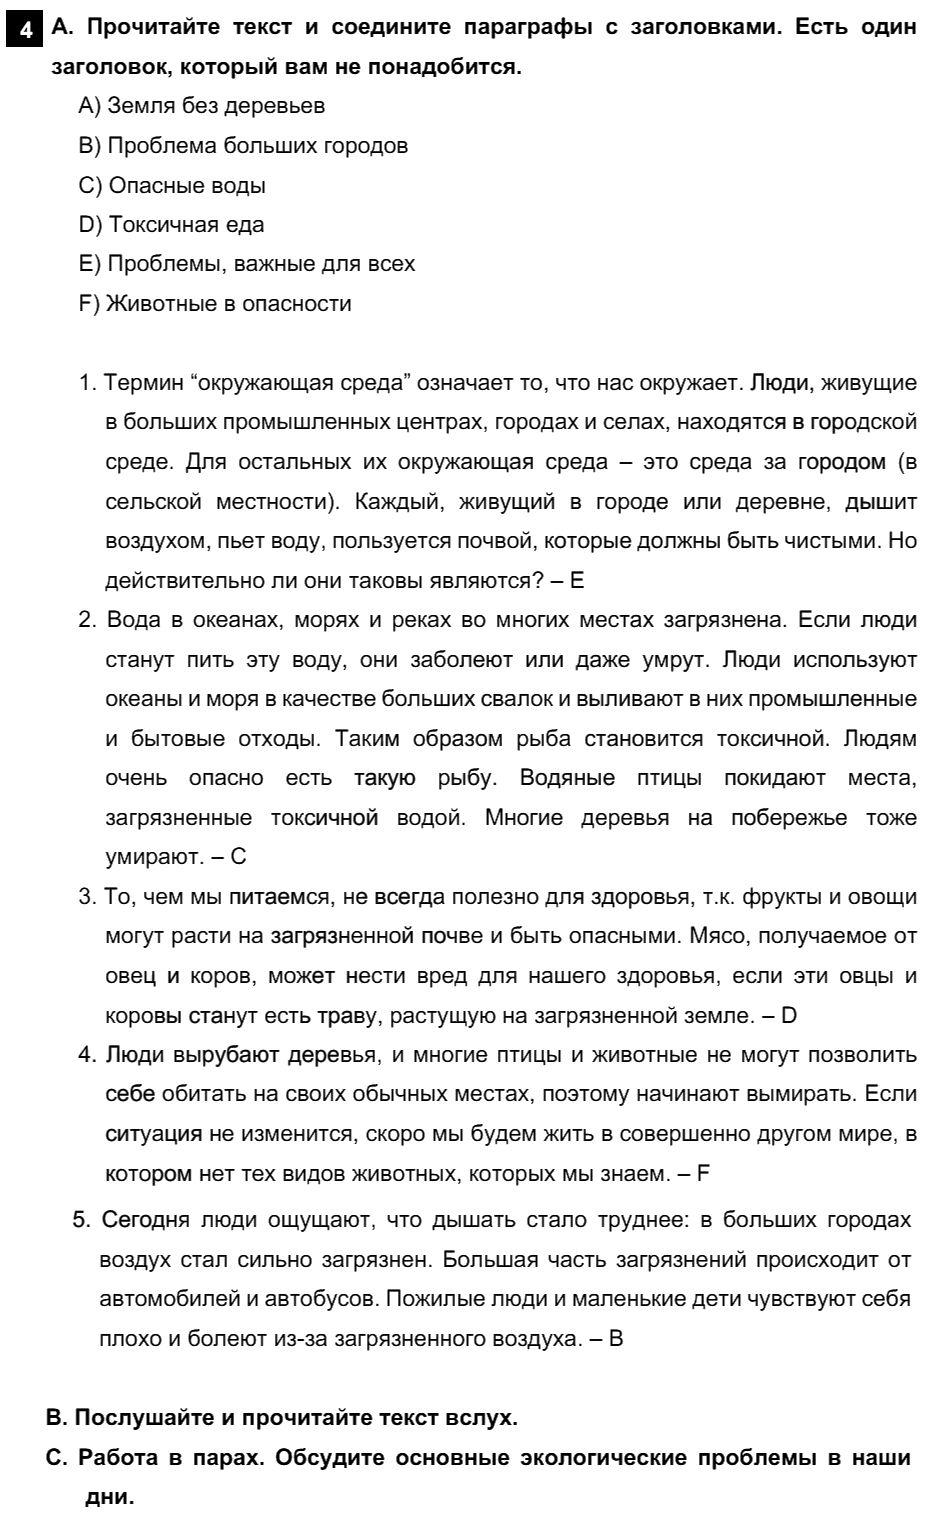 Английский язык 7 класс Афанасьева О. В. Unit 5. Экология / Шаг 5: 4